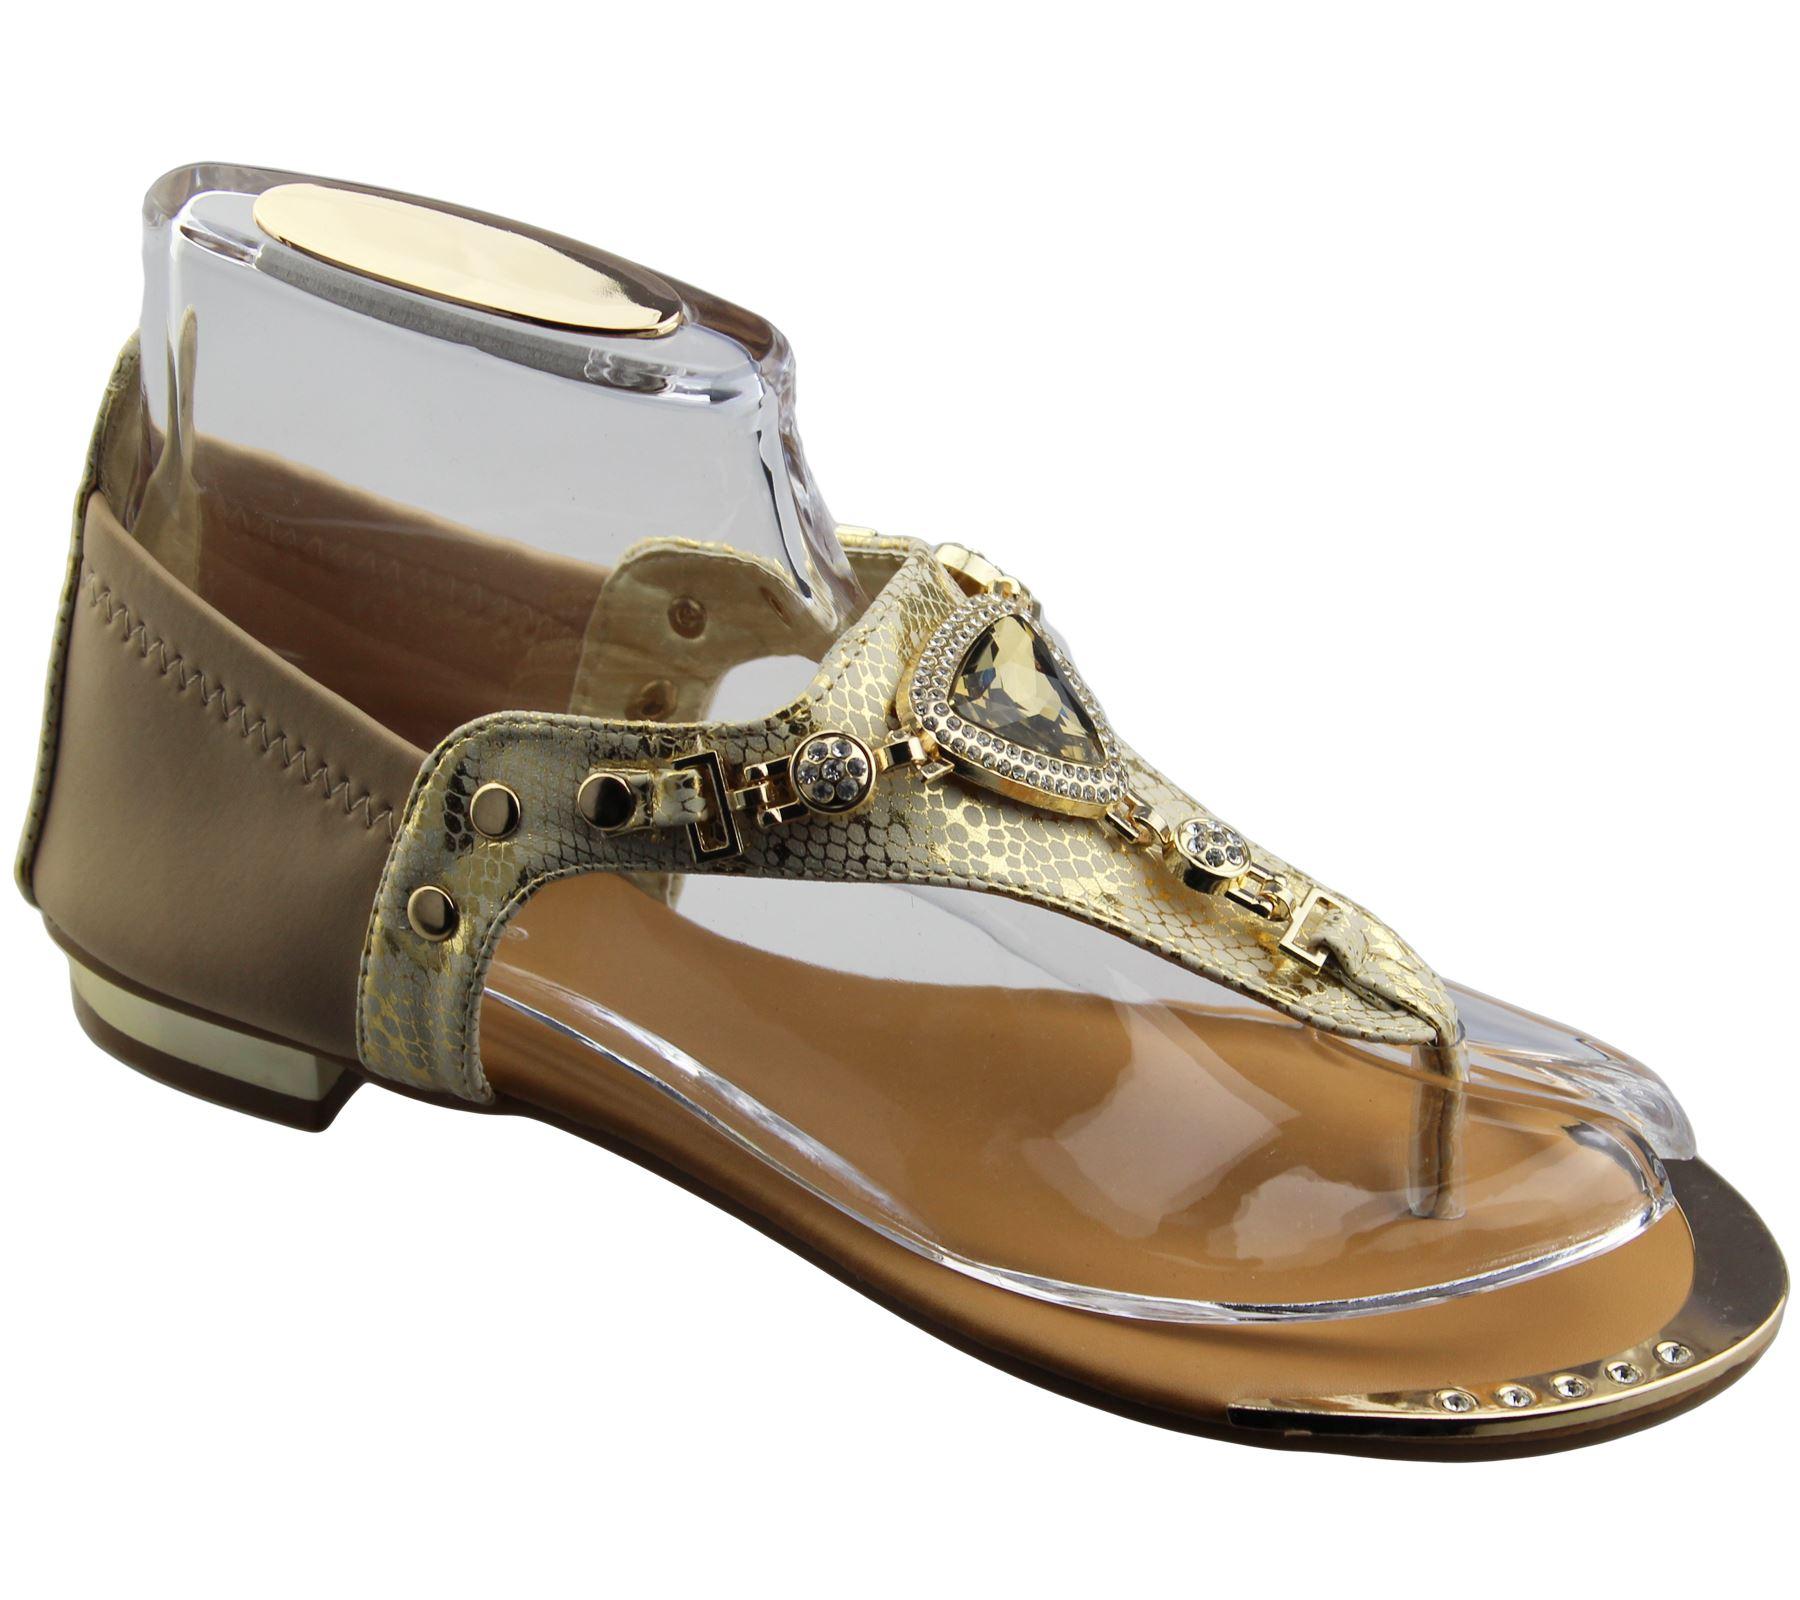 Womens-Flat-Summer-Sandals-Ladies-Diamante-Wedding-Toe-Post-Casual-Slipper thumbnail 20